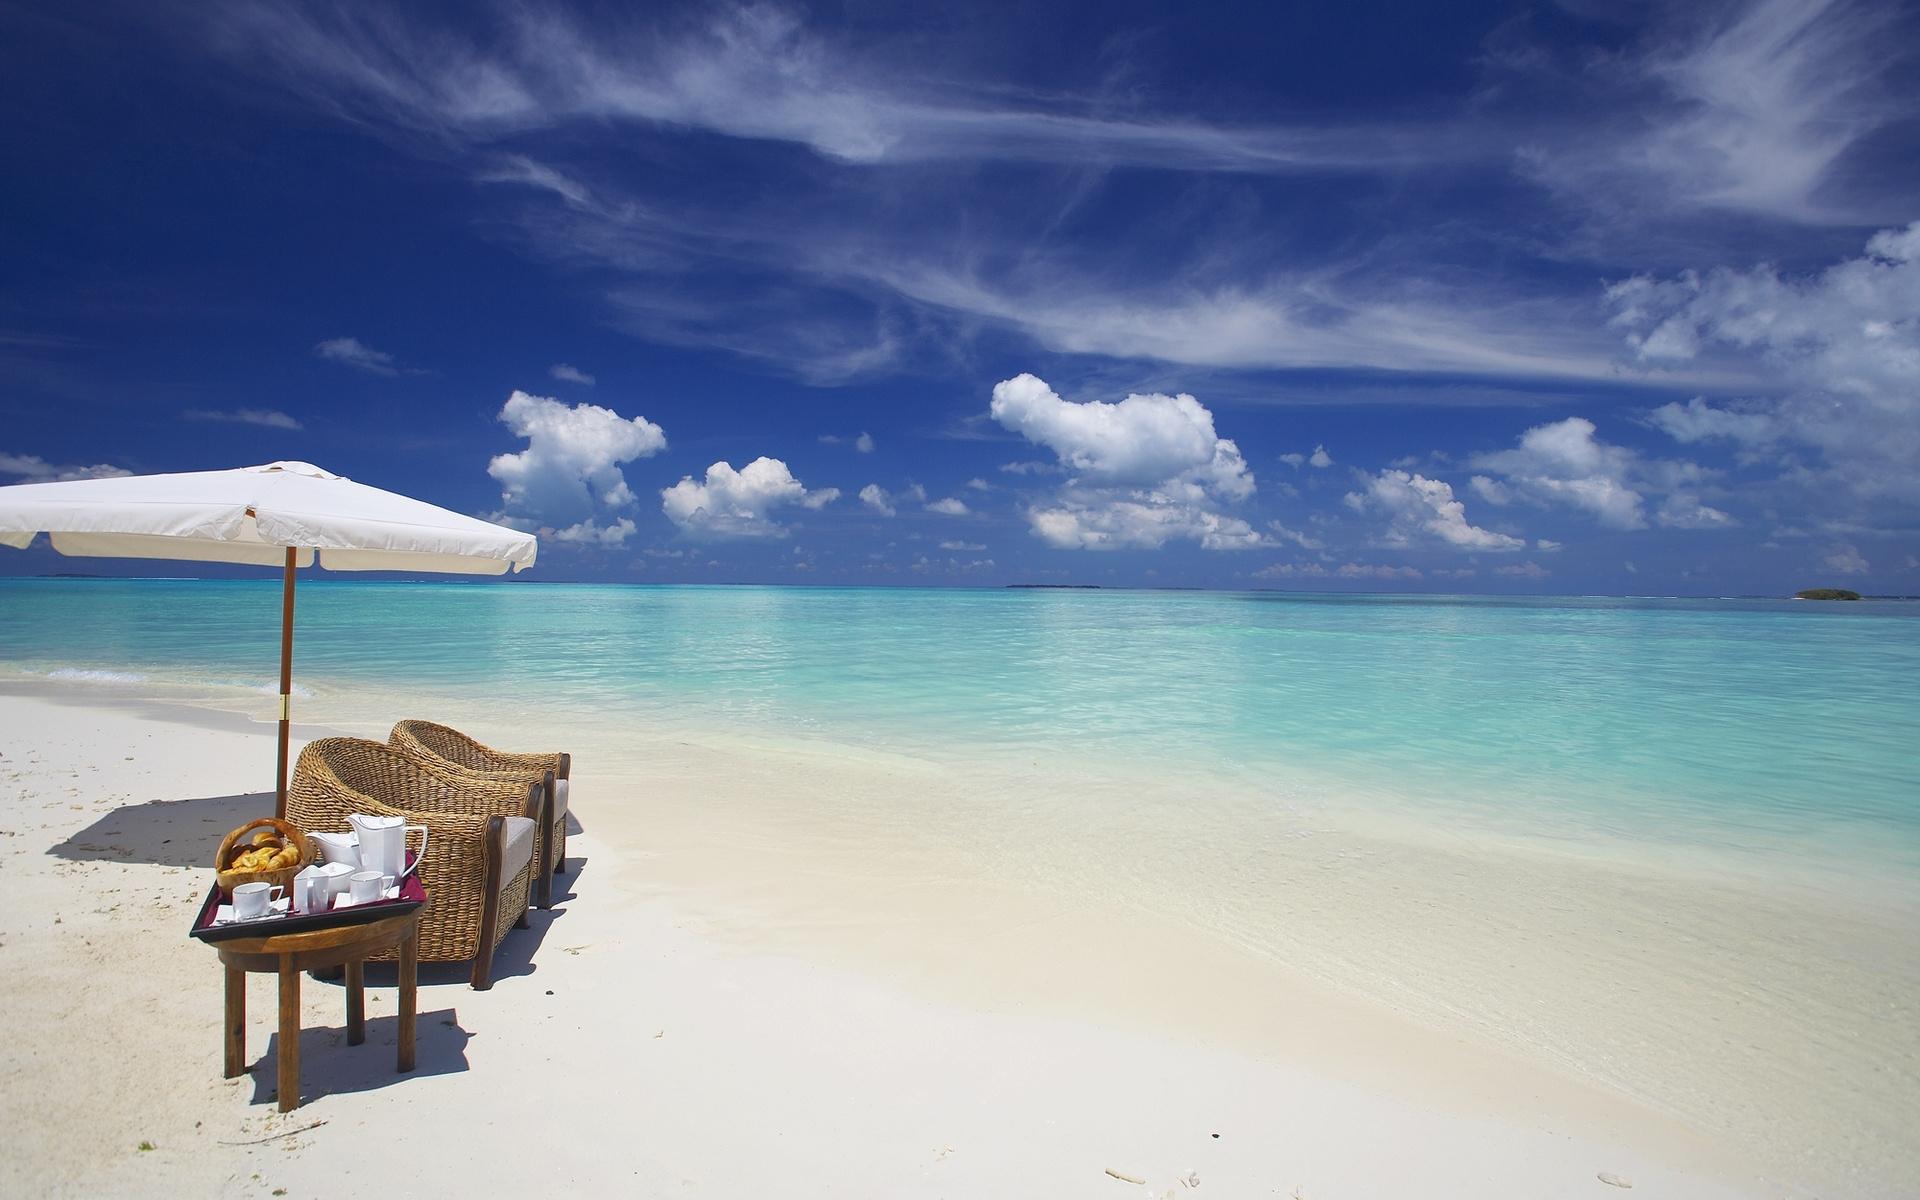 Exotic beach wallpaper   1348679 1920x1200